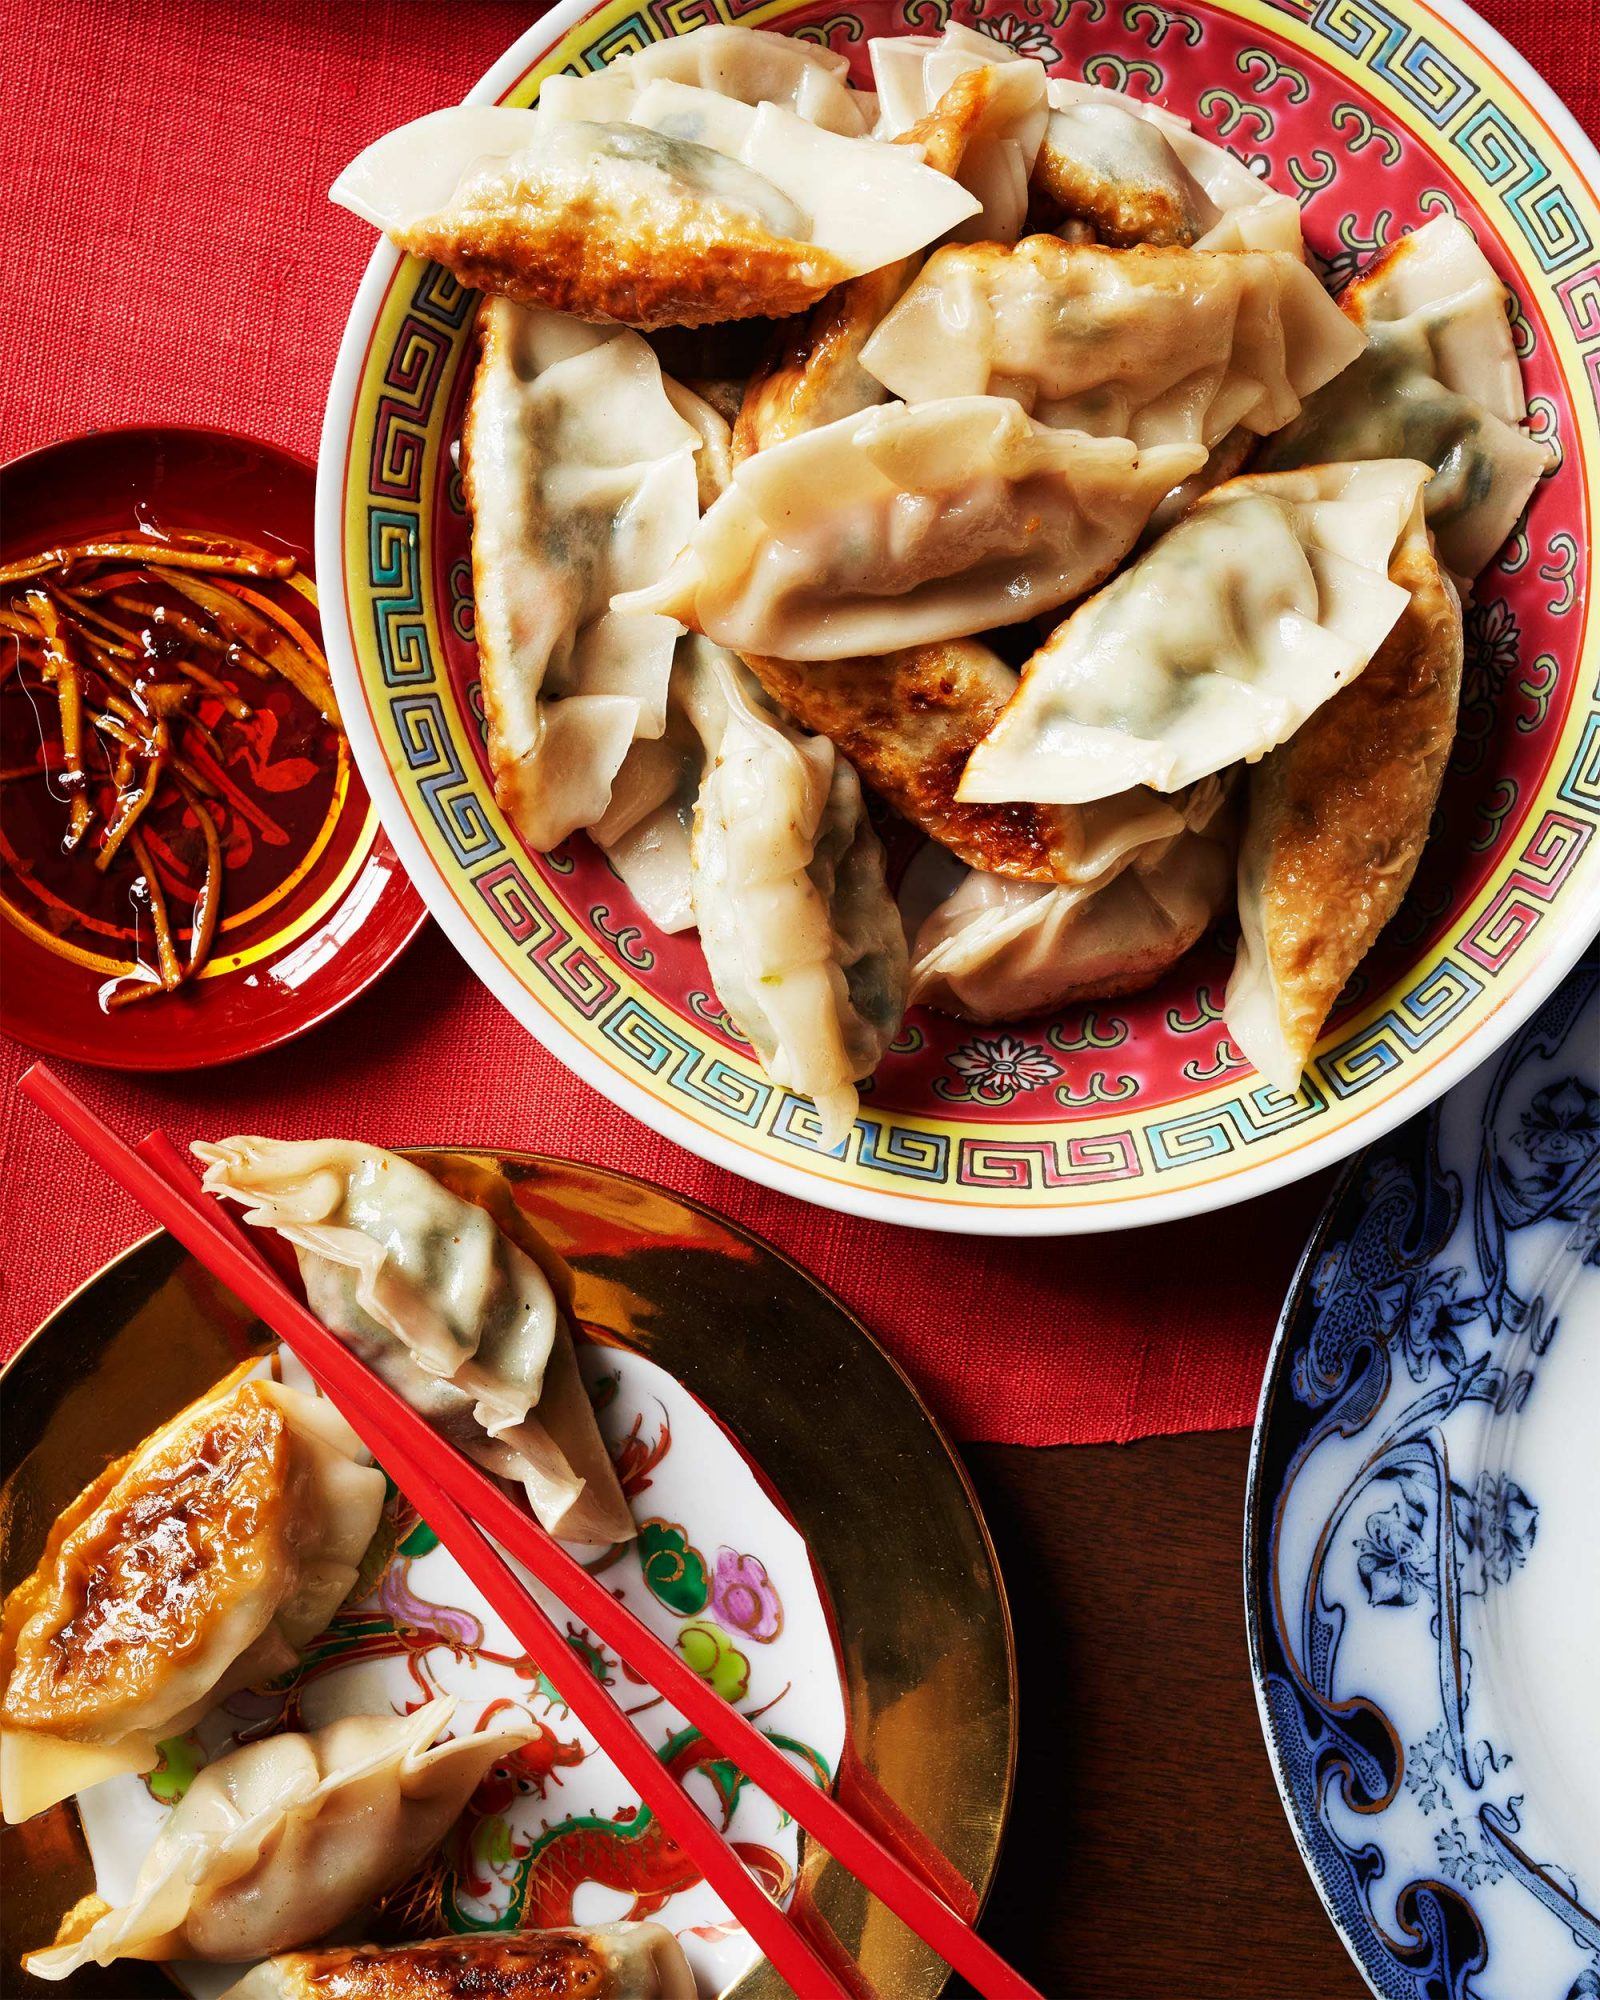 Chinese Dumplings with Edamame & Shiitake Filling